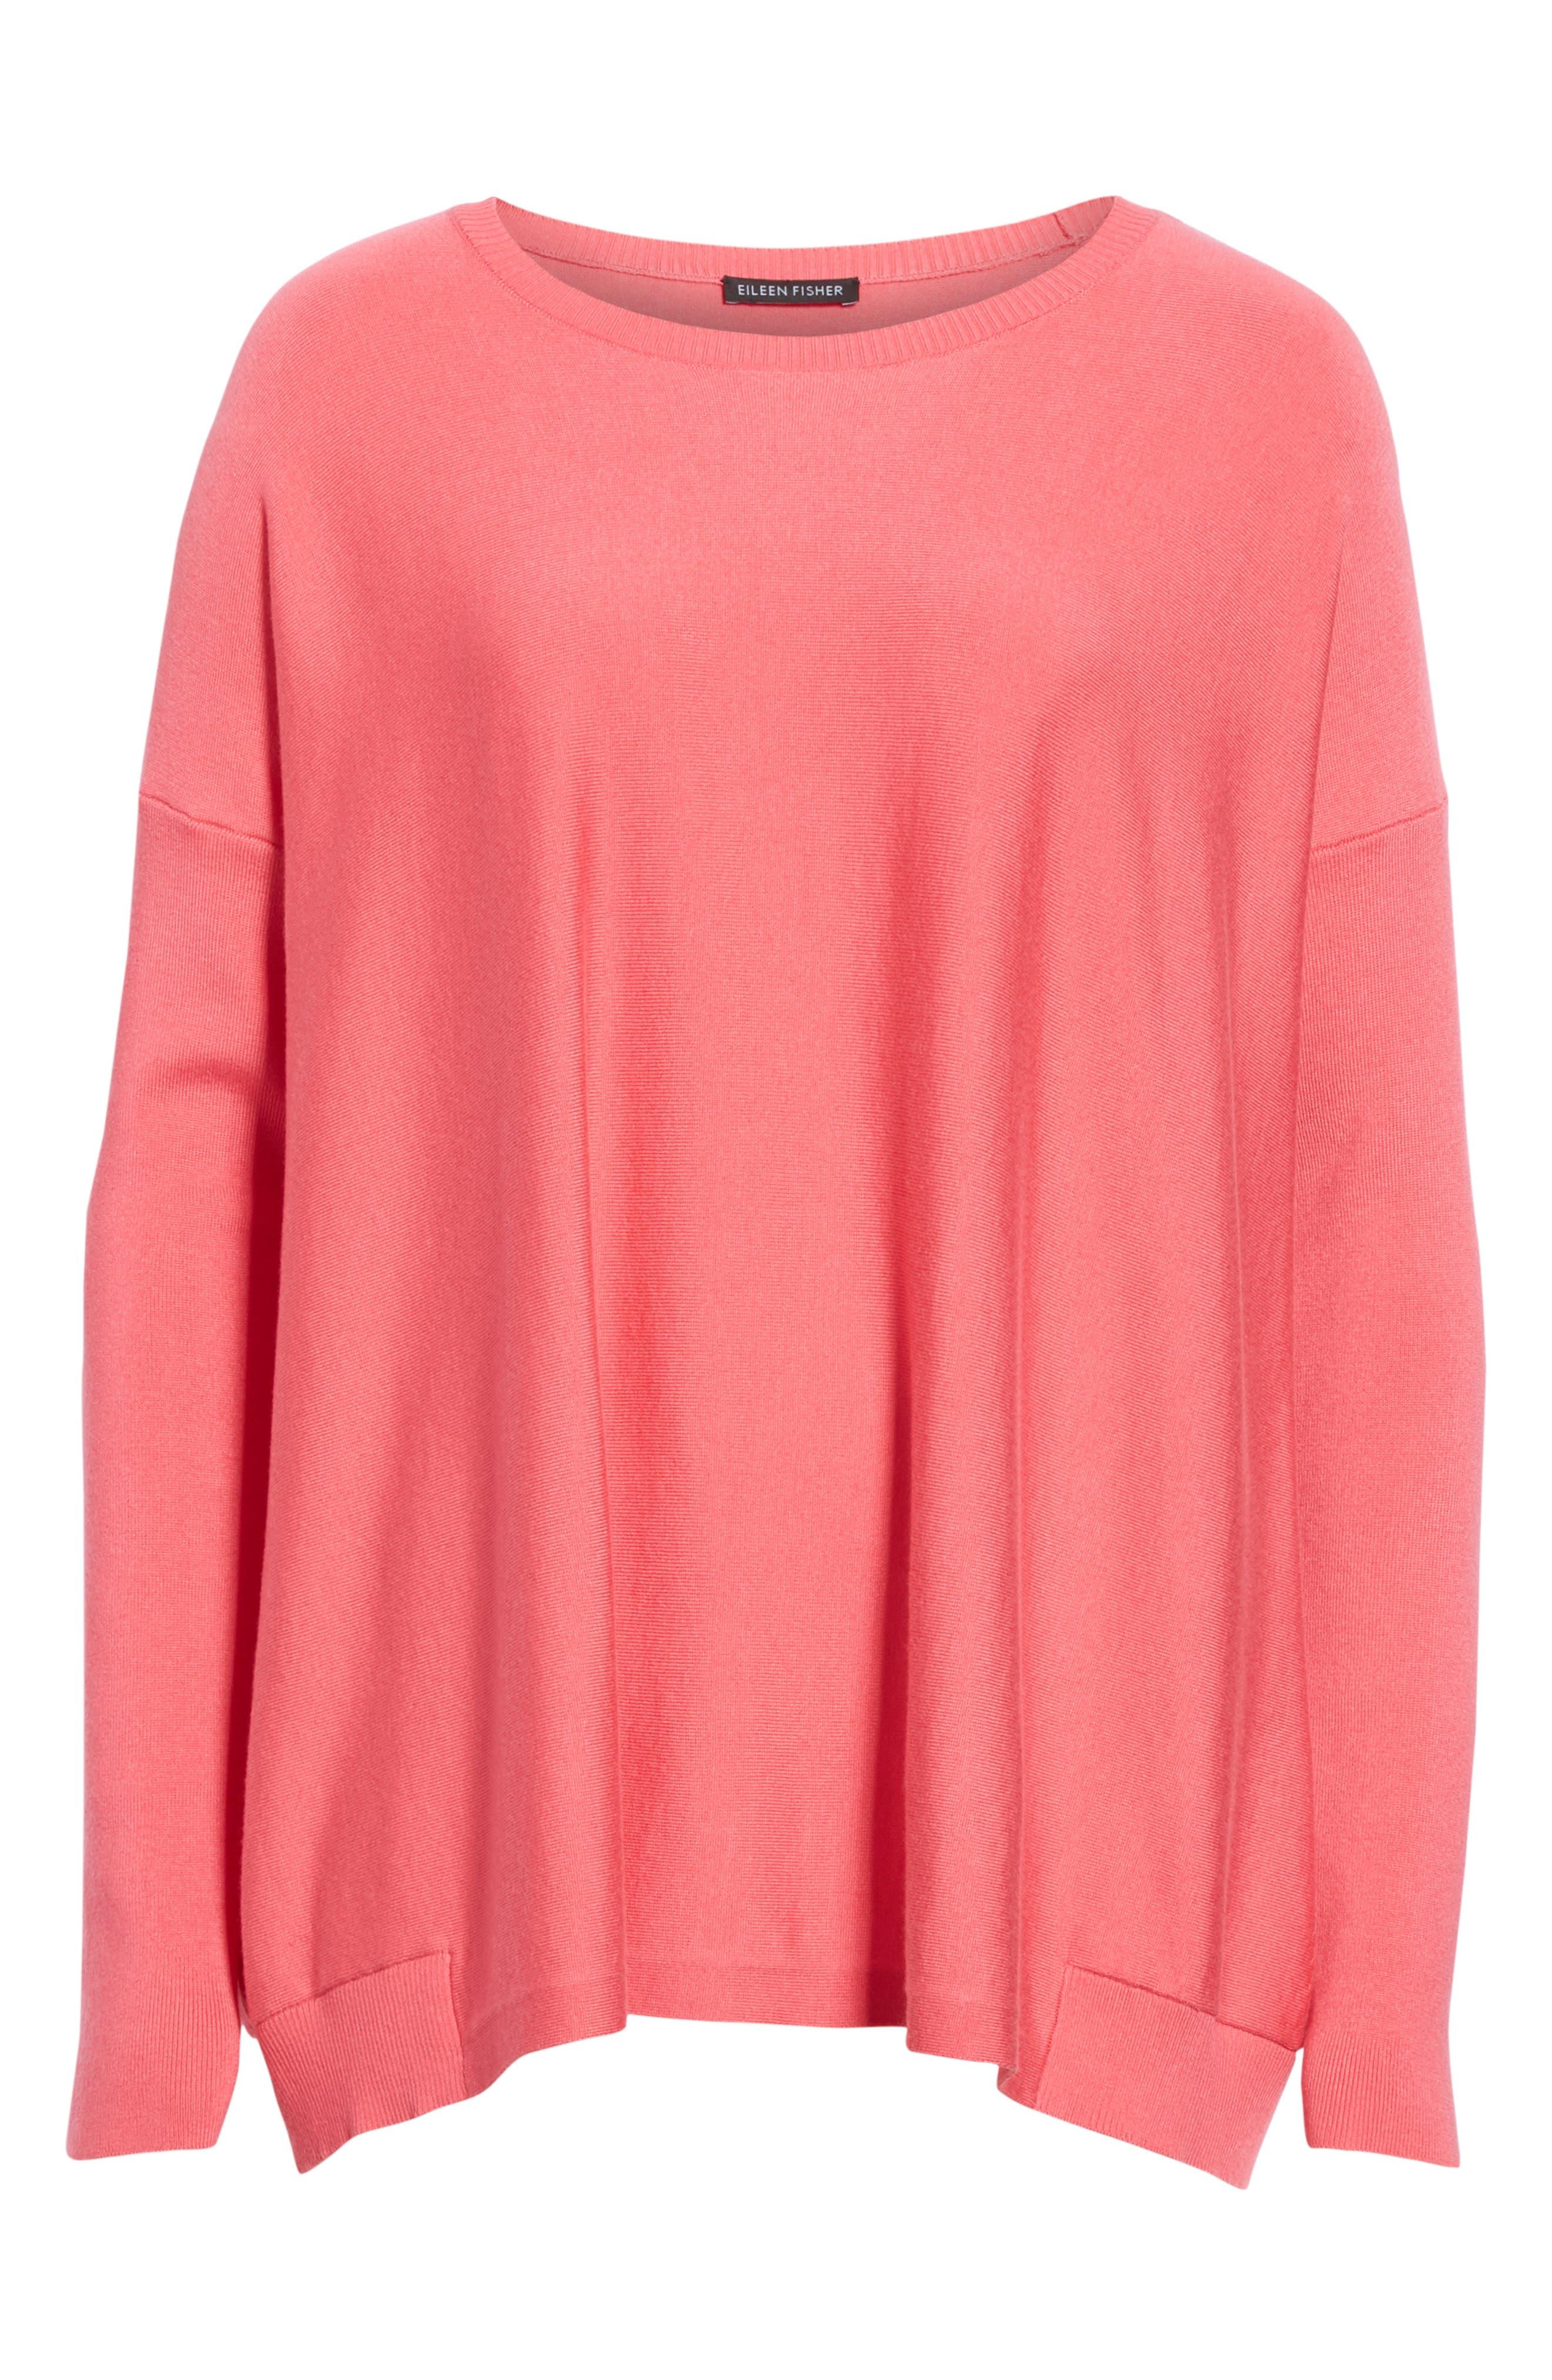 Tencel<sup>®</sup> Lyocell Blend Sweater,                             Alternate thumbnail 6, color,                             CHERRY LANE